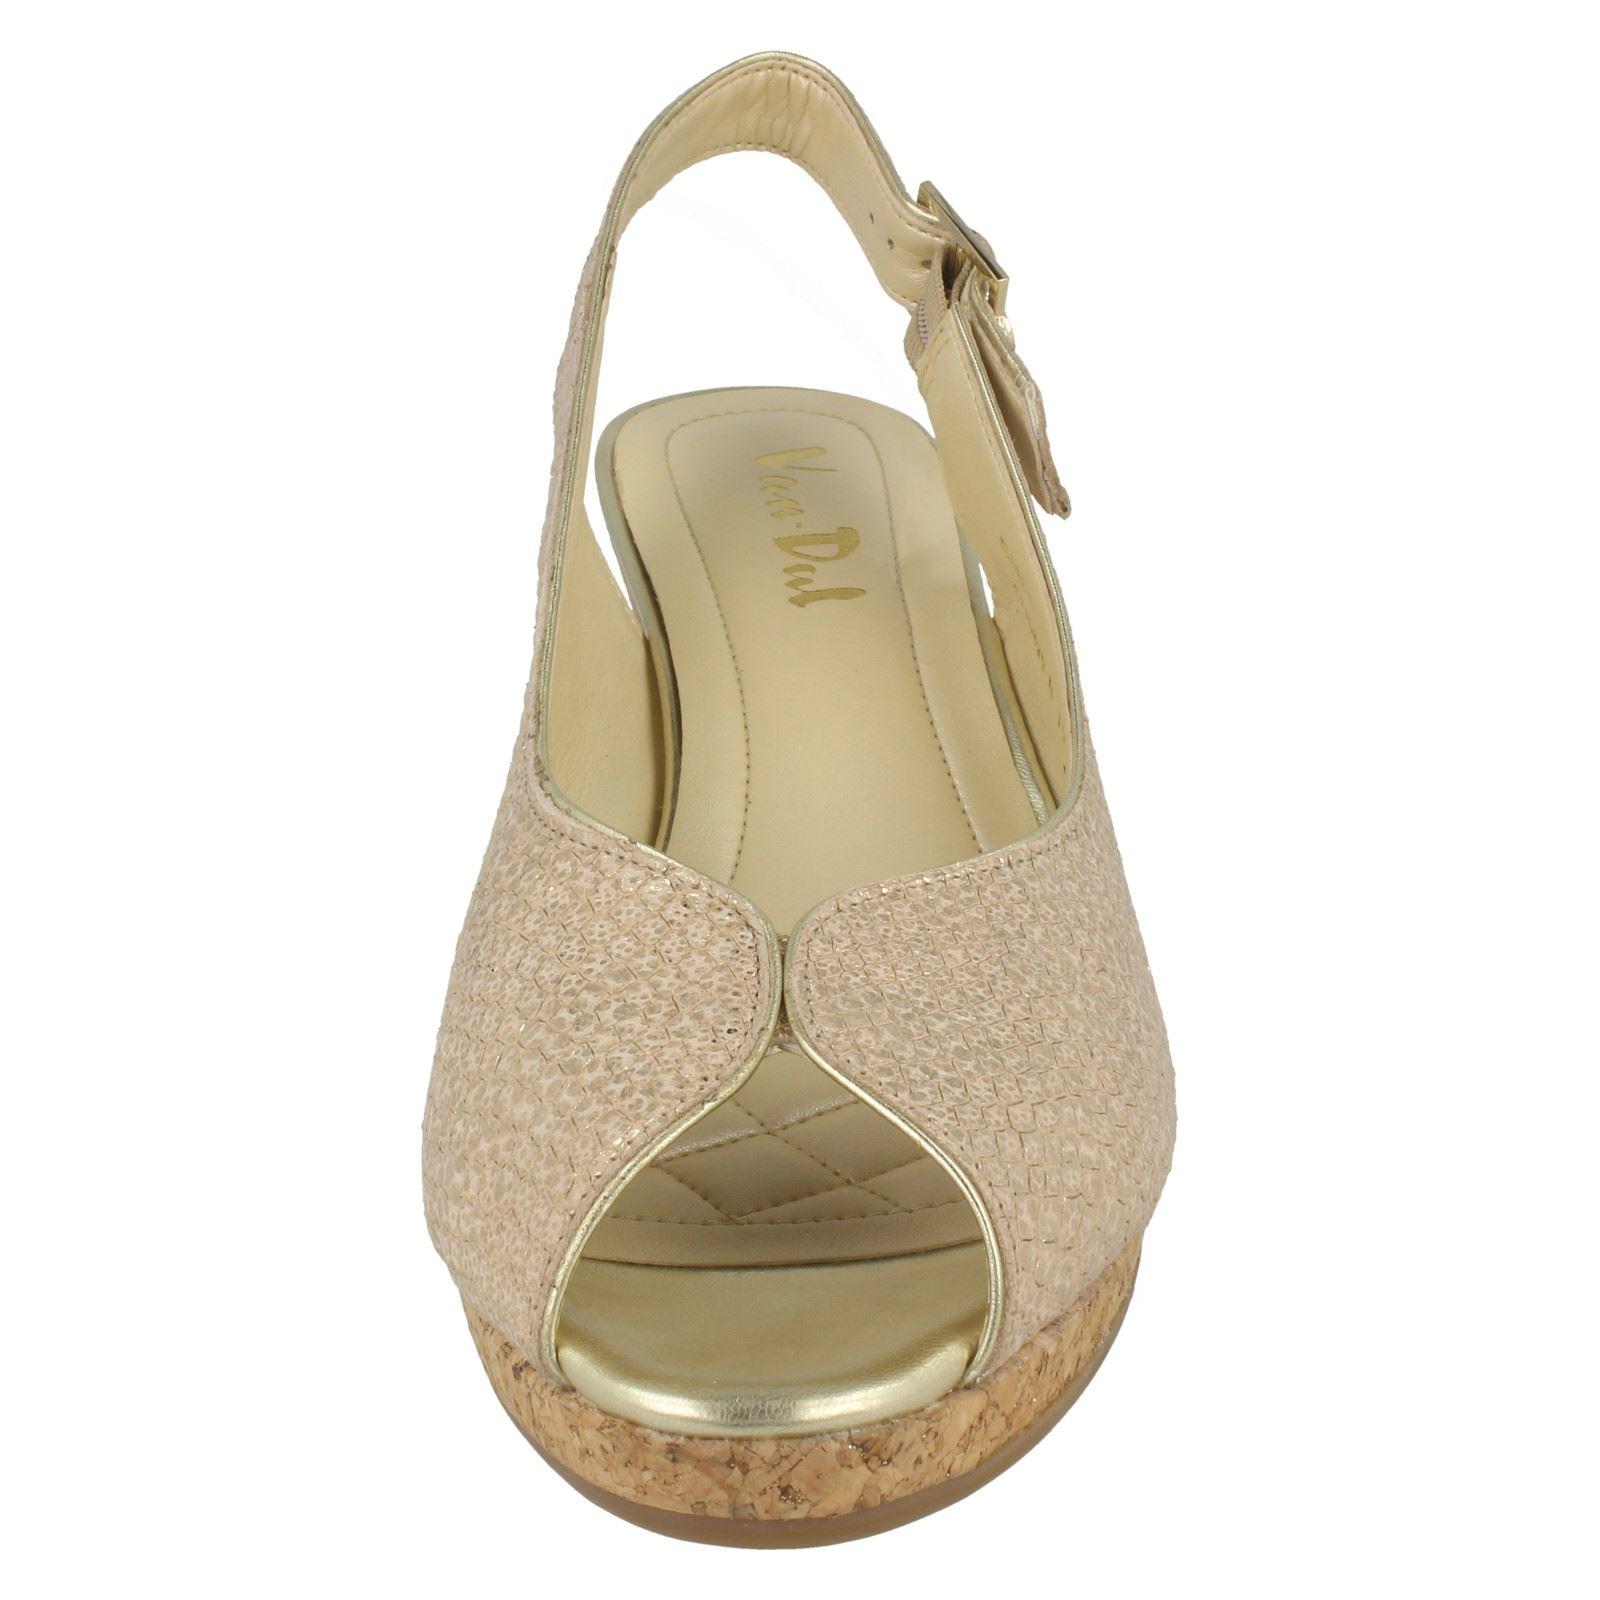 Ladies-Van-Dal-Cork-Wedge-Sandals-039-Gable-039 thumbnail 8